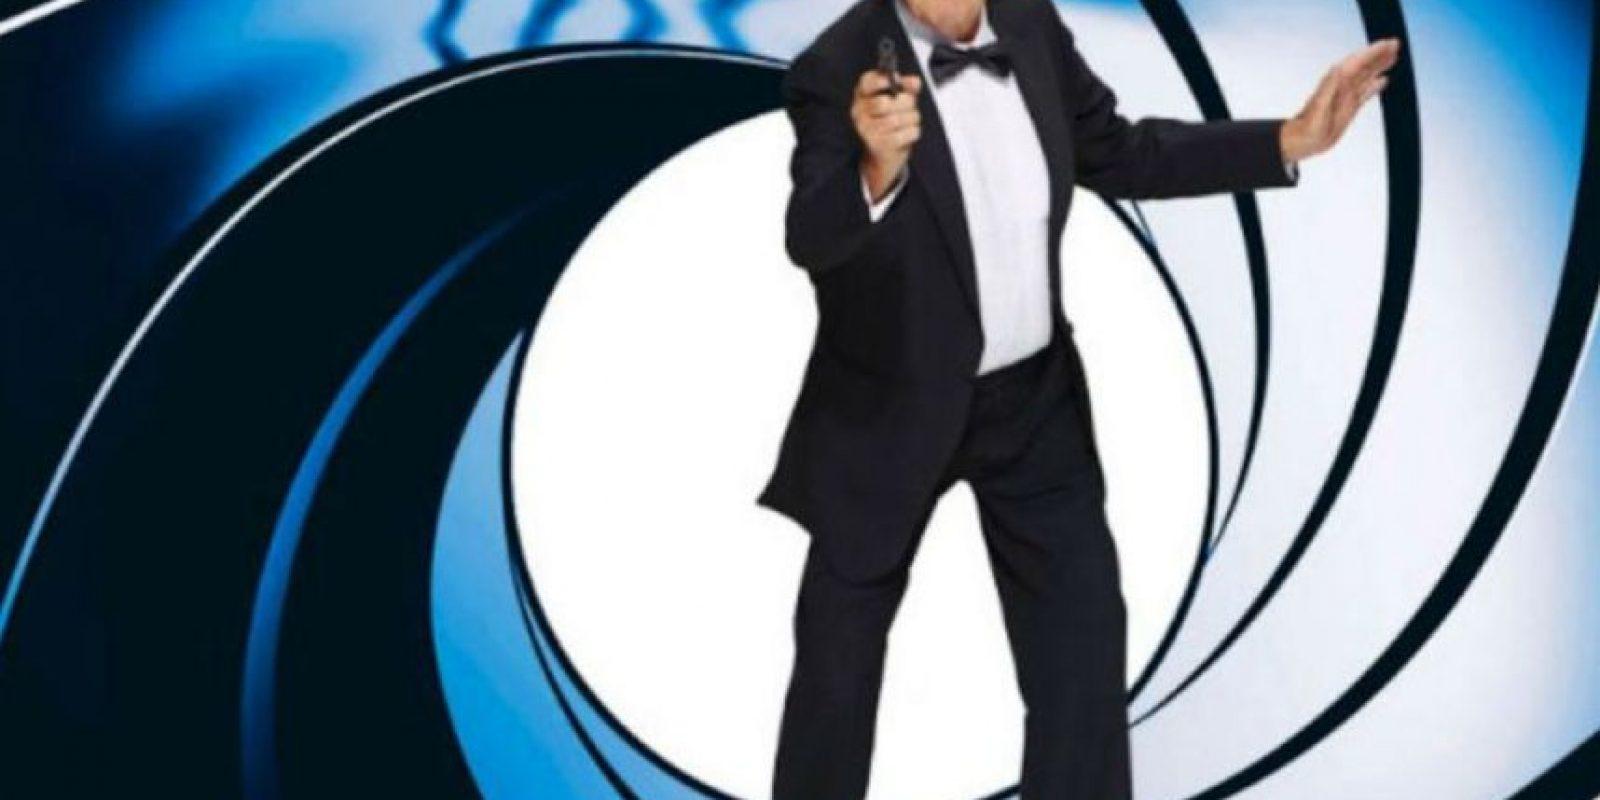 James Bond Foto:Vía Igmur